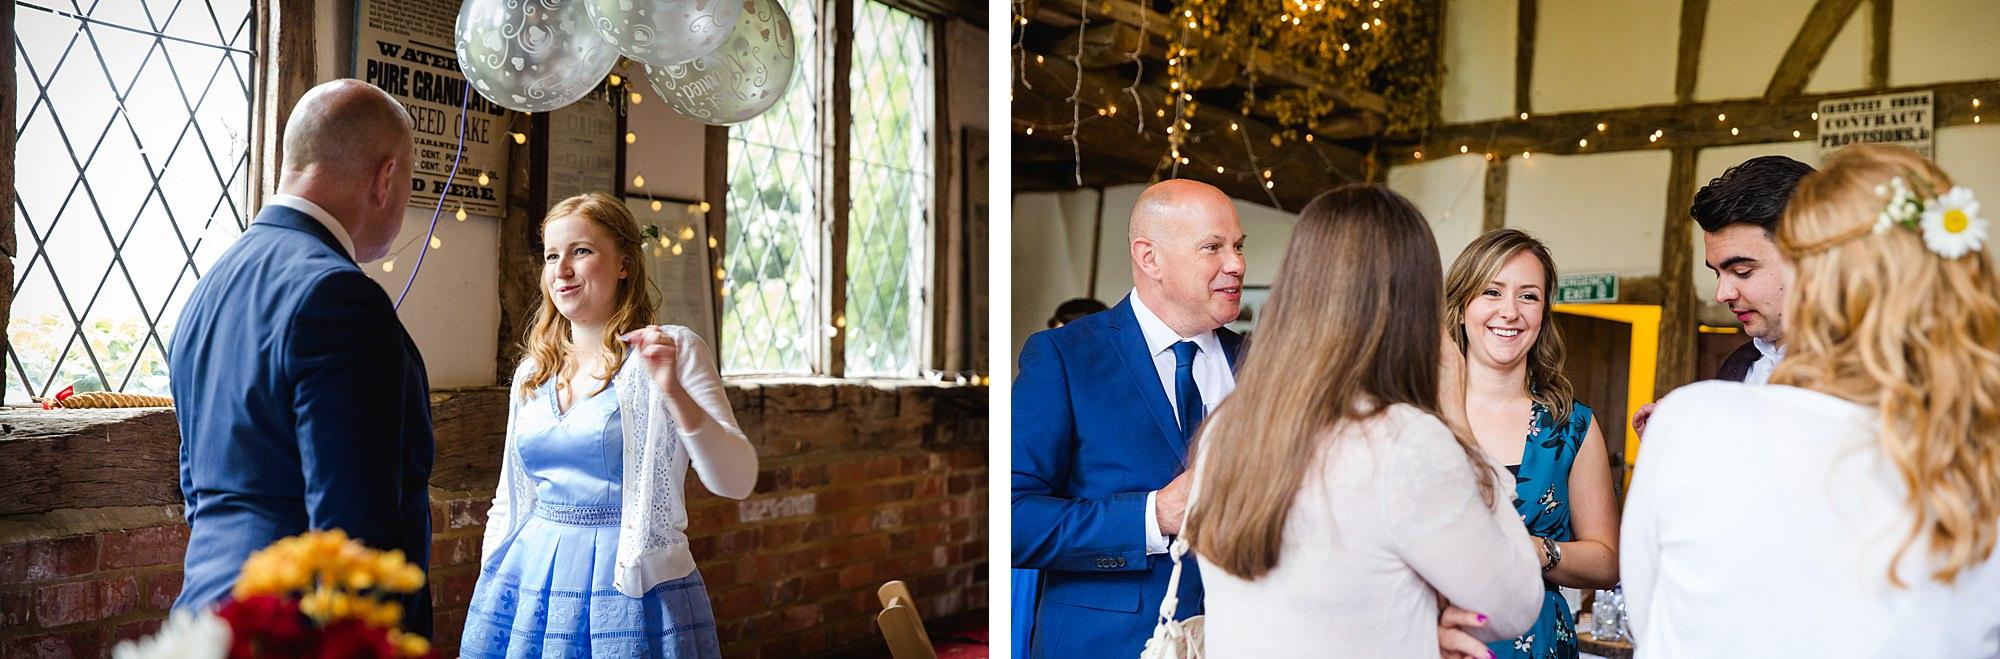 Fun DIY wedding guests chatting inside norwood barn